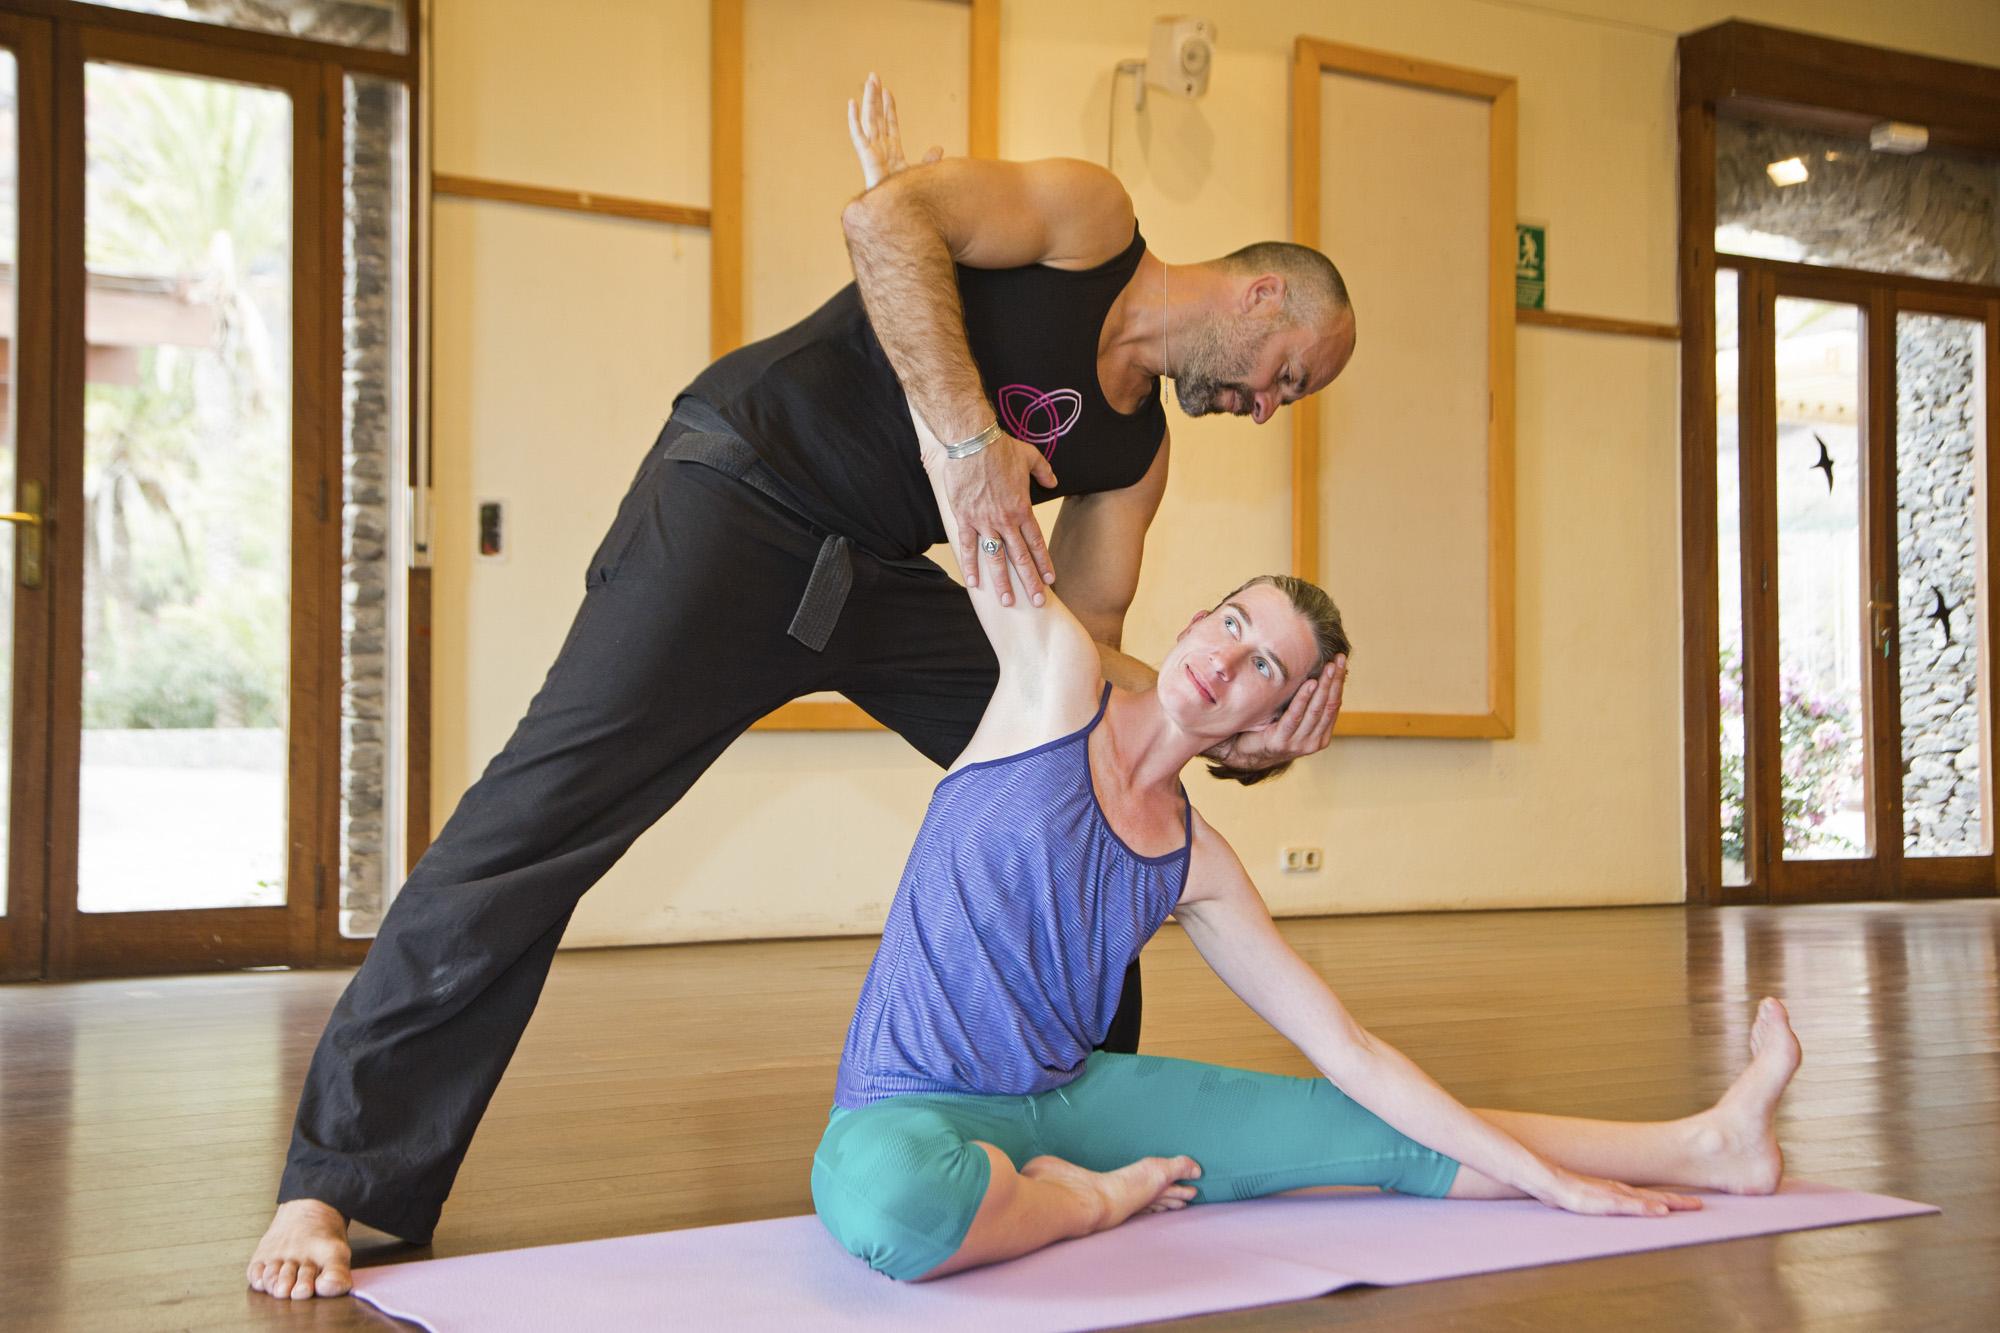 Spanien, Kanarische Inseln, La Gomera, Hotel El Cabrito, Yoga Retreat mit Yoga Team Berlin, Autorin Andrea Mertens beim Yoga, Lehrer Valentin Alex